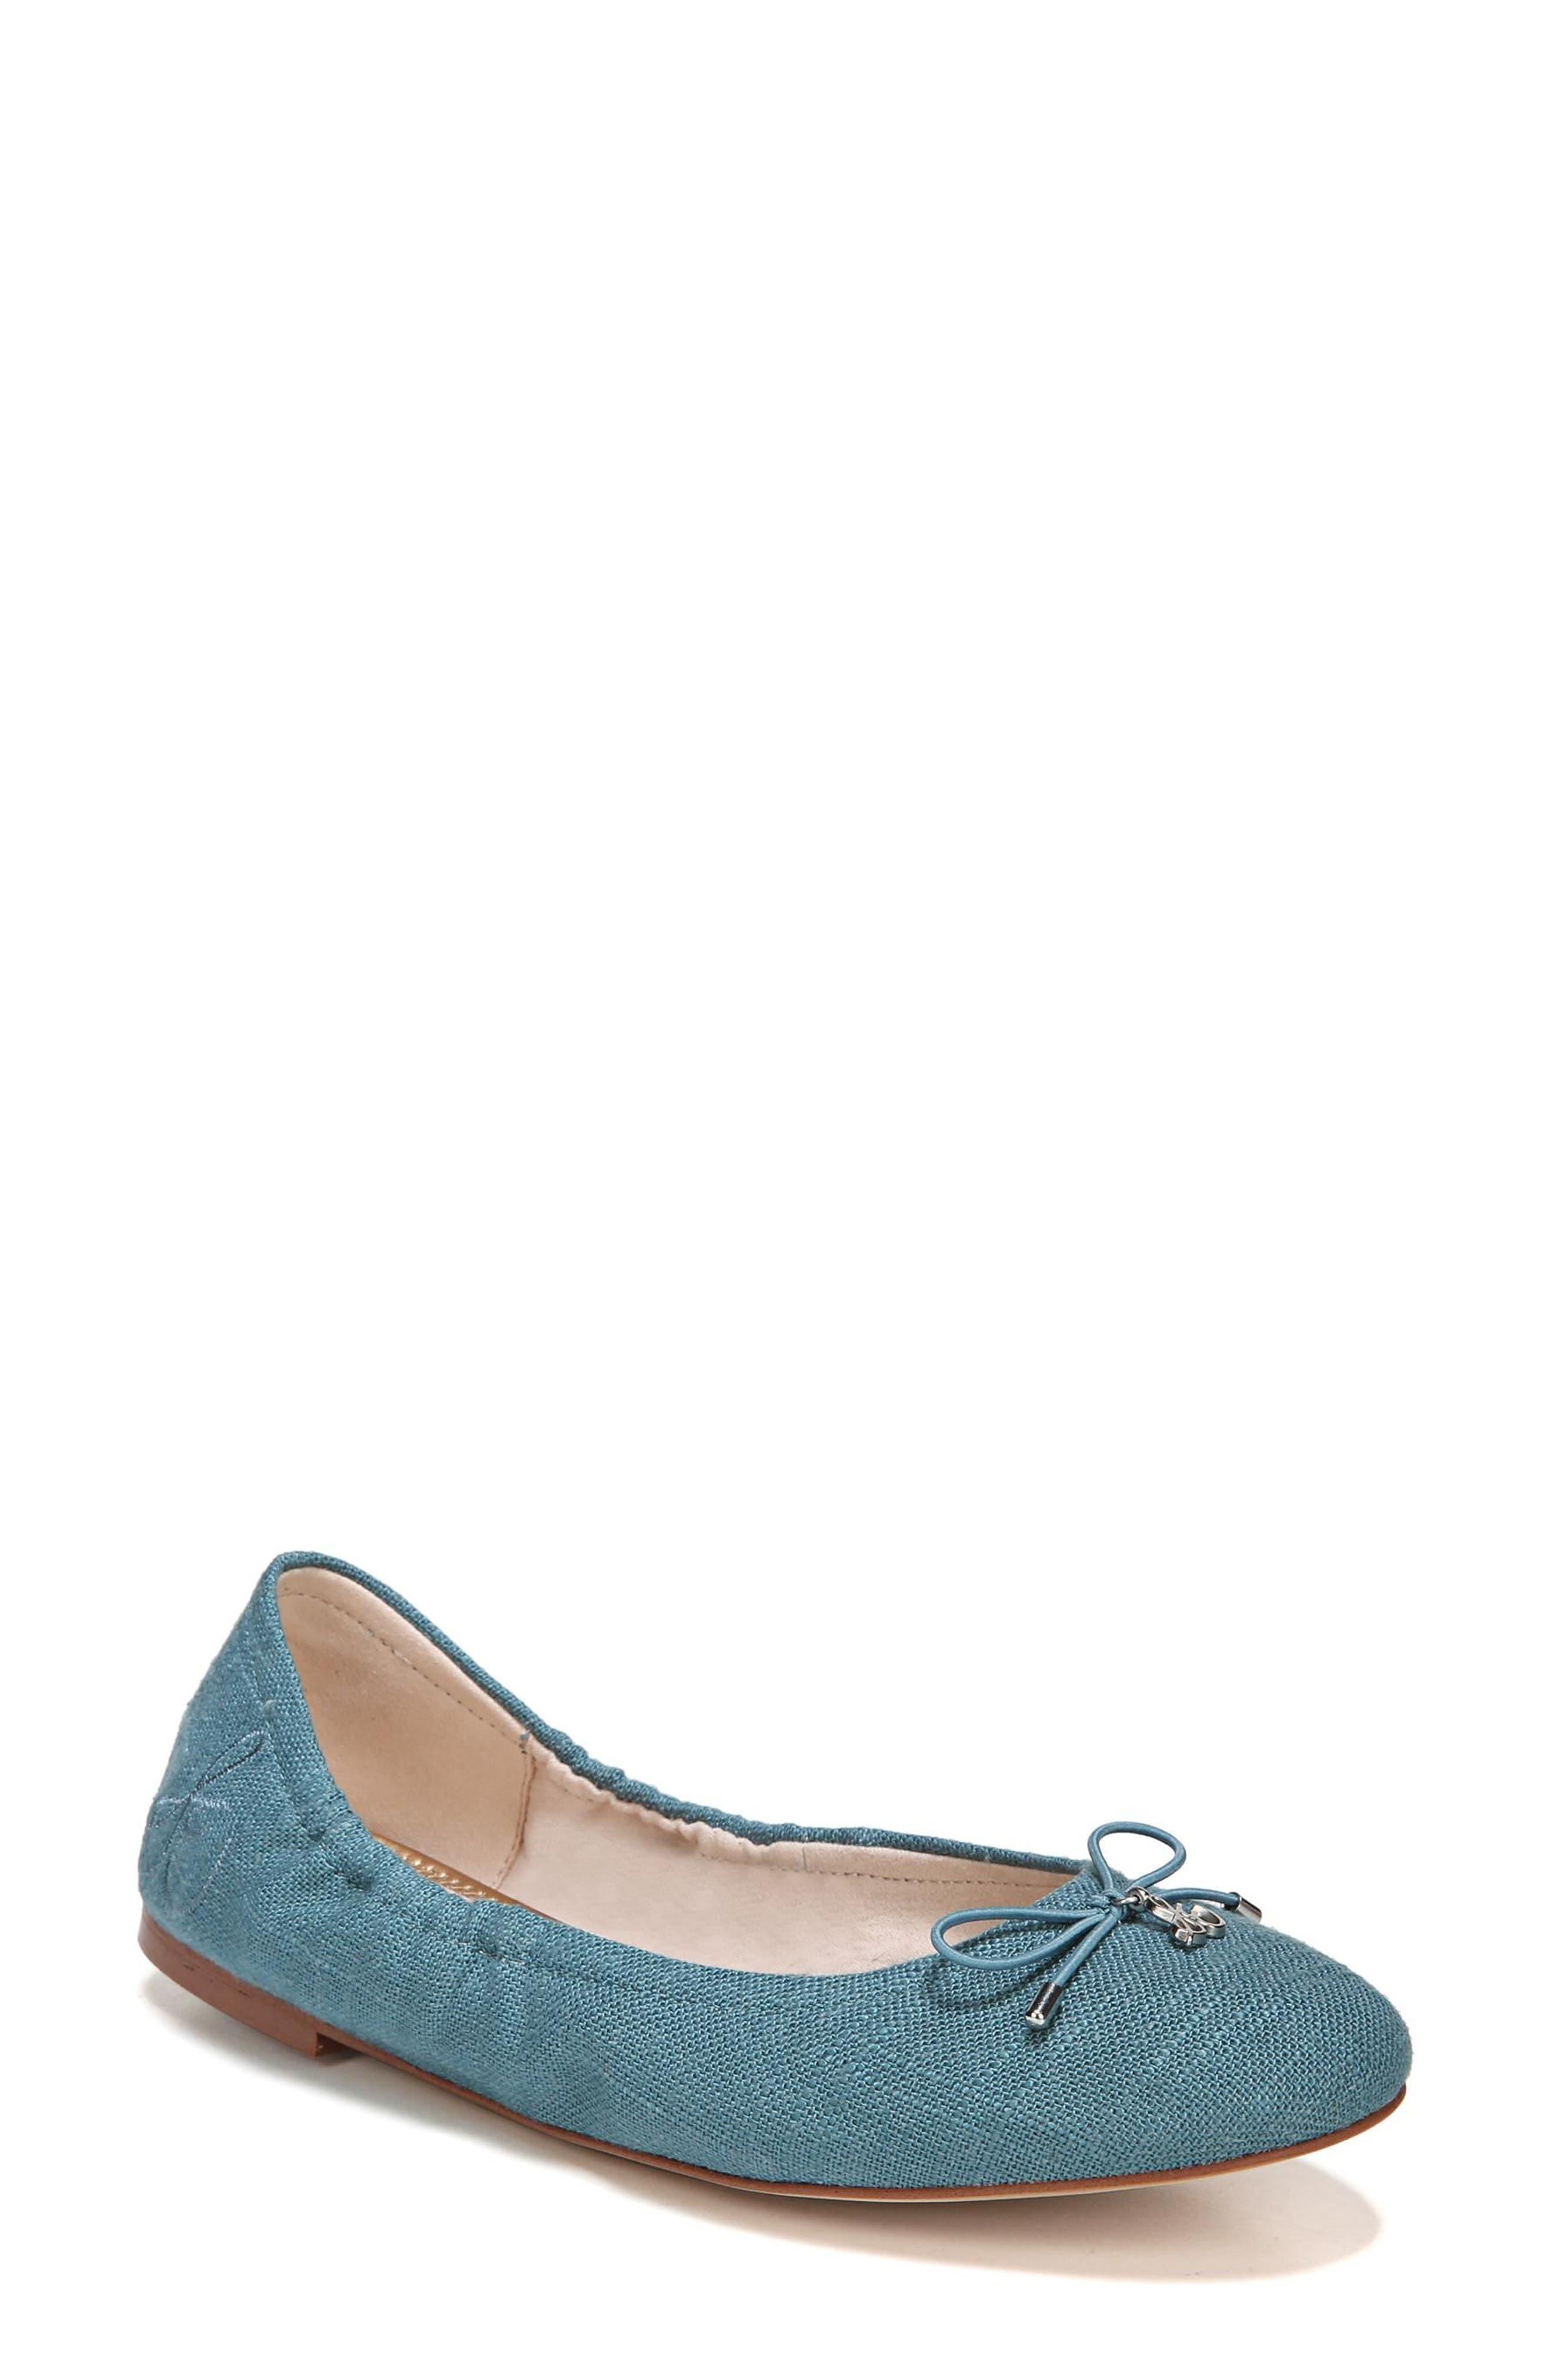 Felicia Flat,                         Main,                         color, DENIM BLUE FABRIC